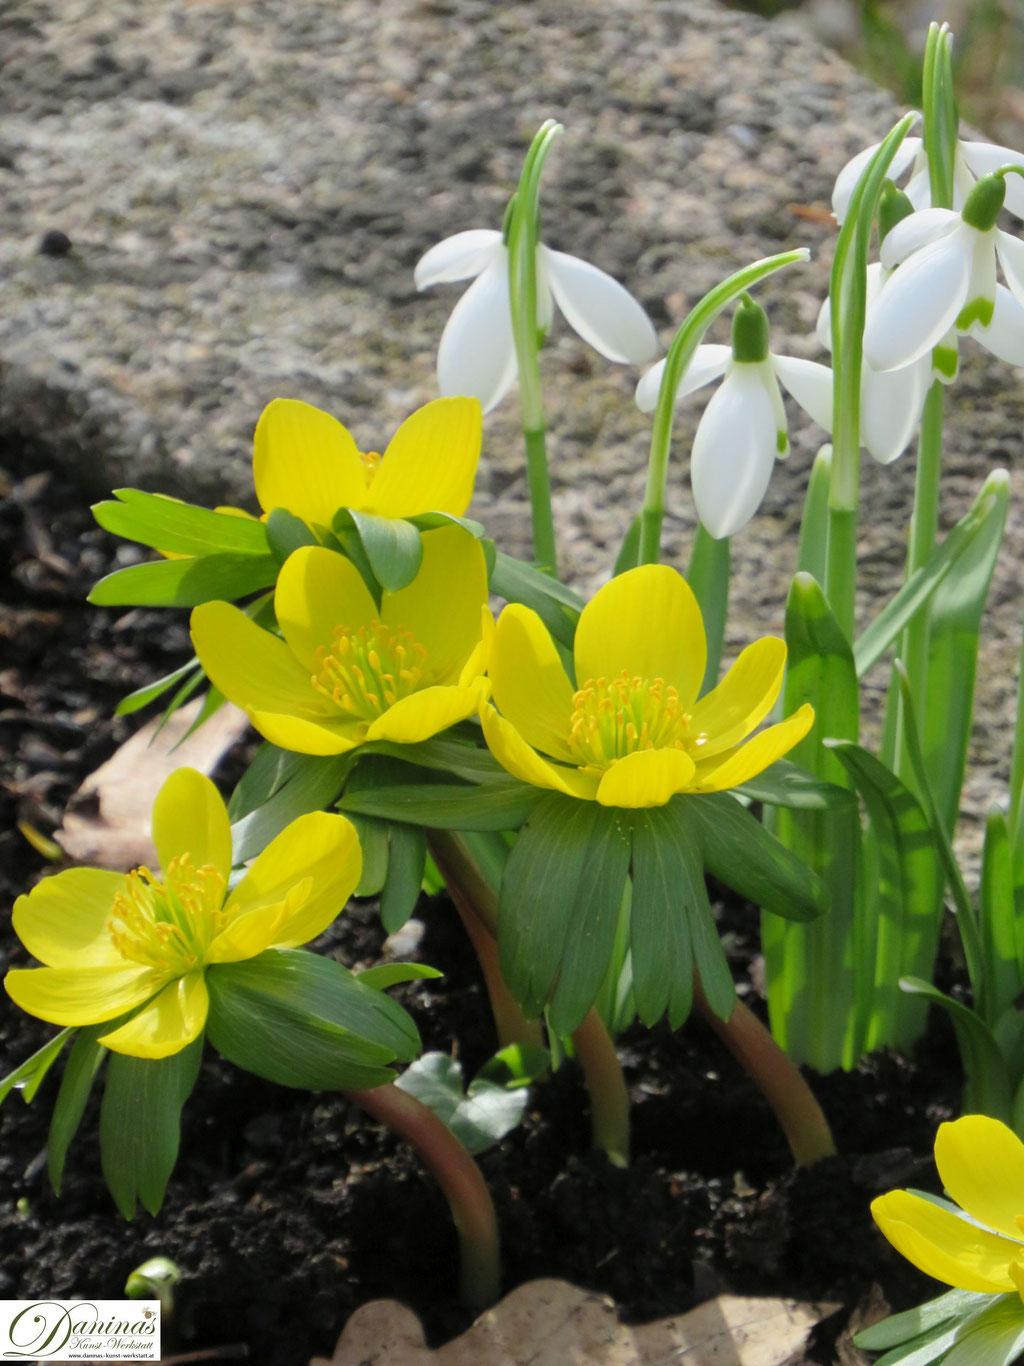 Winterlinge - gelbe Frühlingsblumen